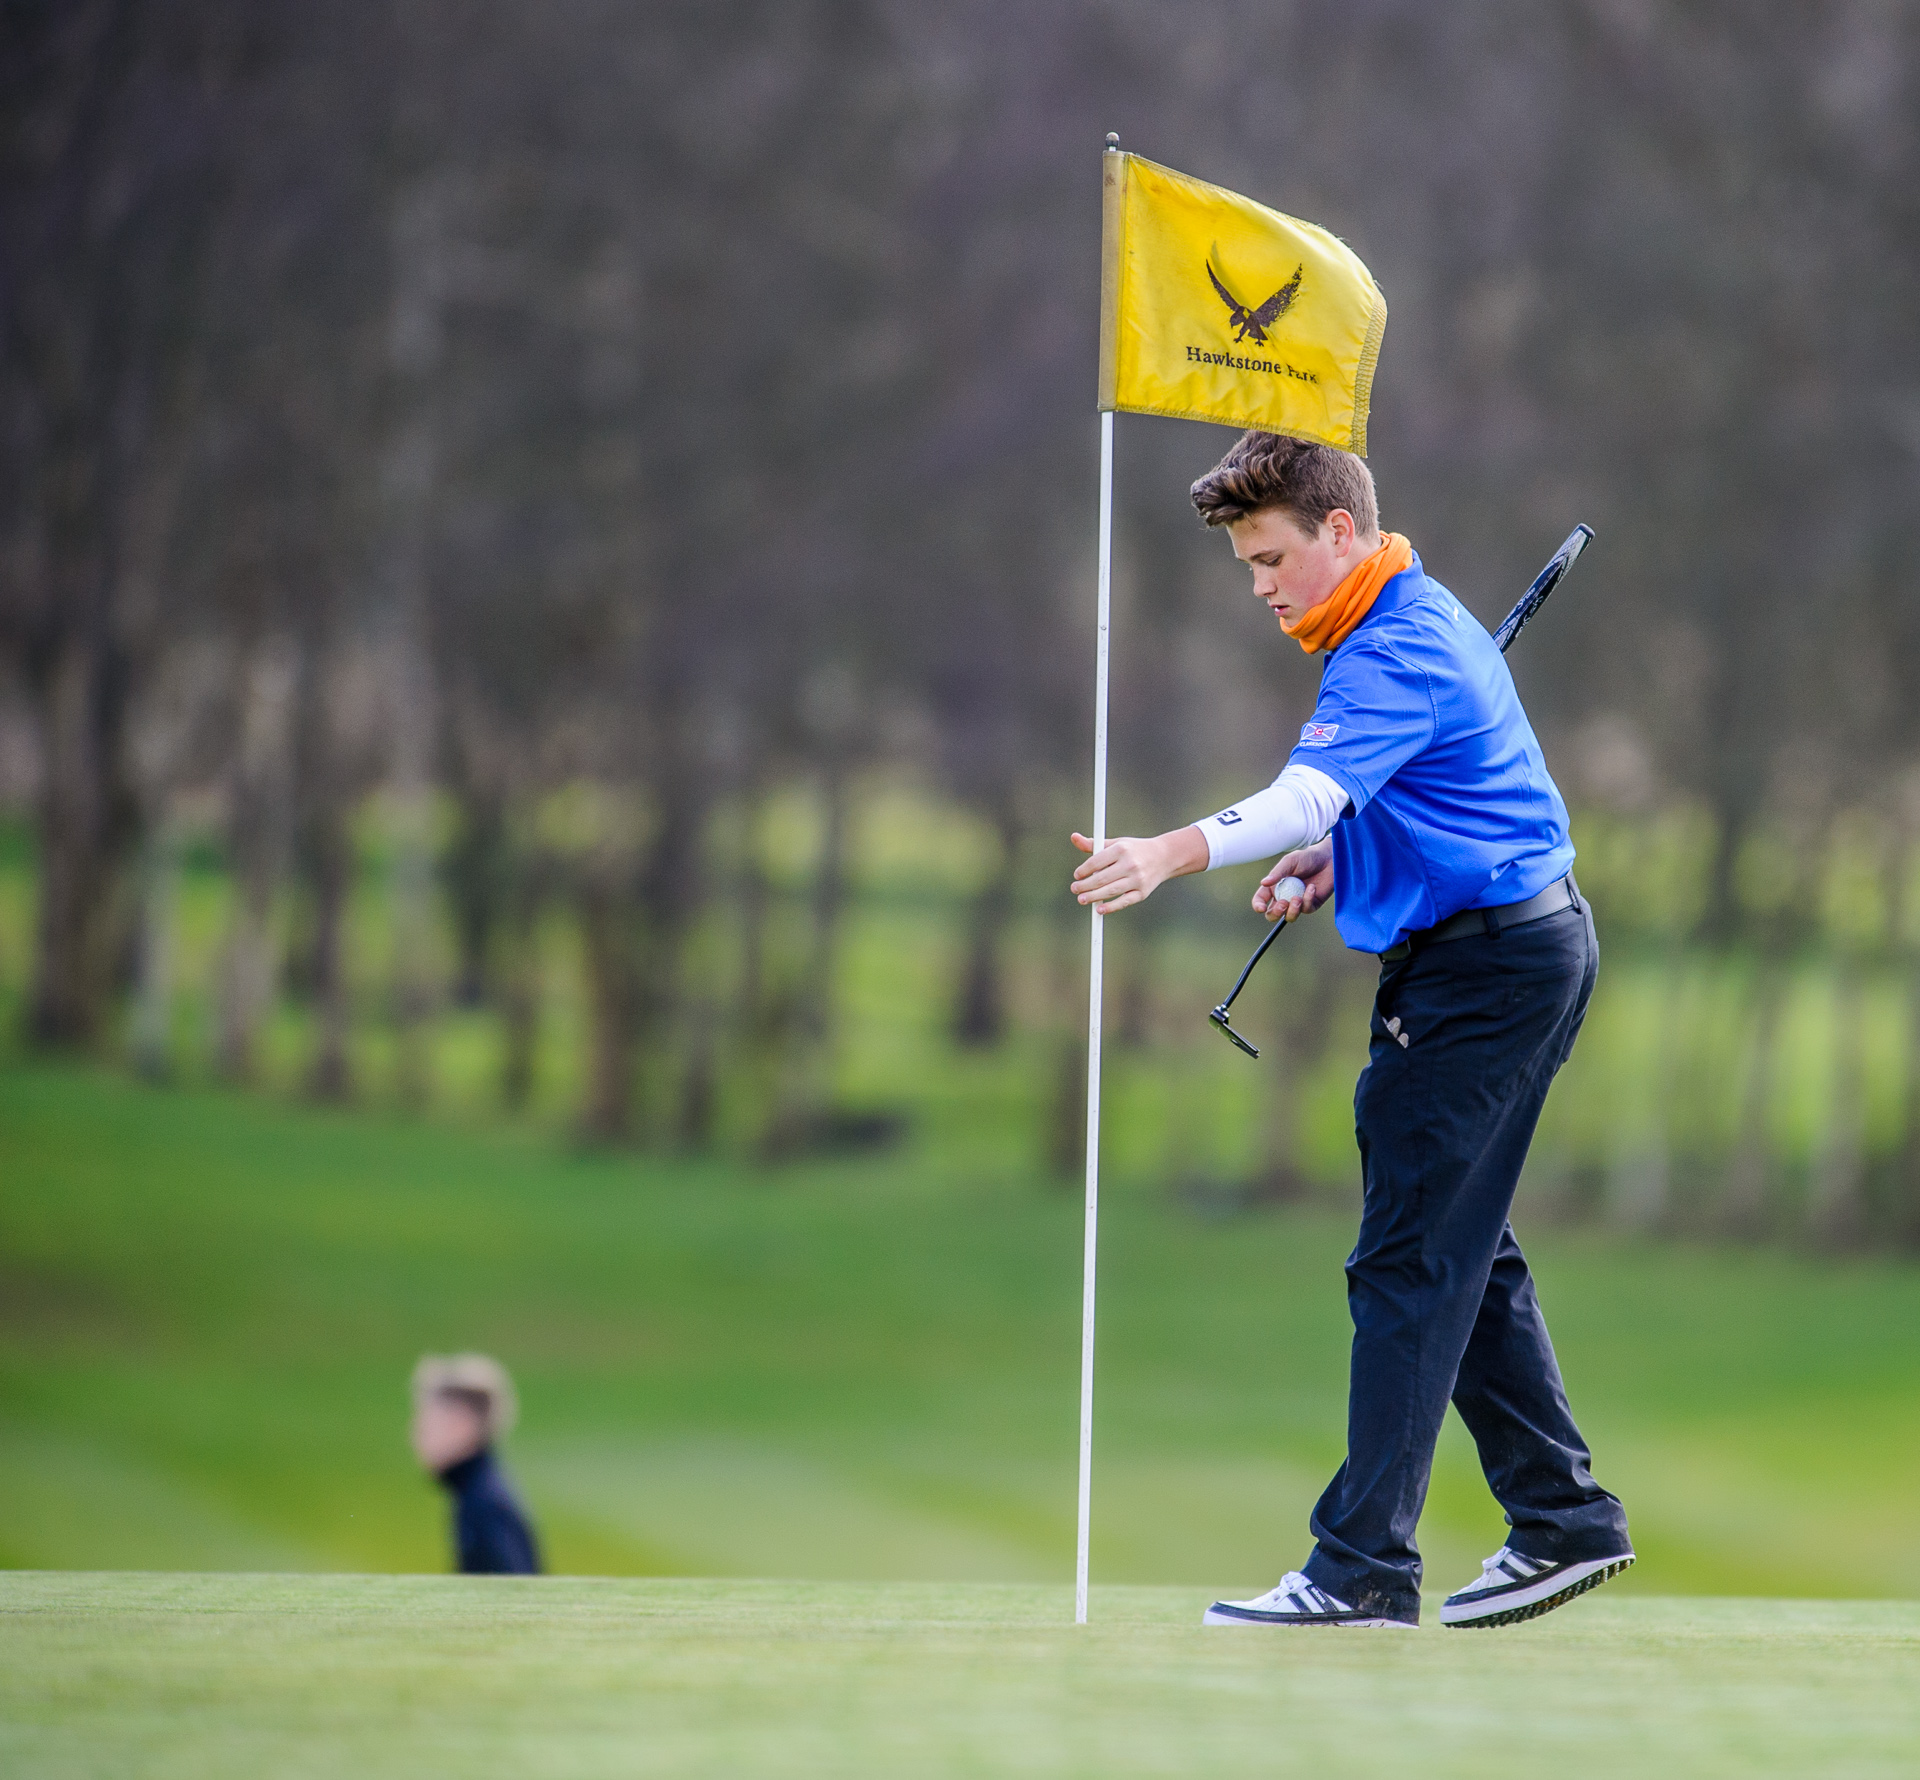 Kevindiss.com golf course photography Hawkstone Park golf course-2724.jpg